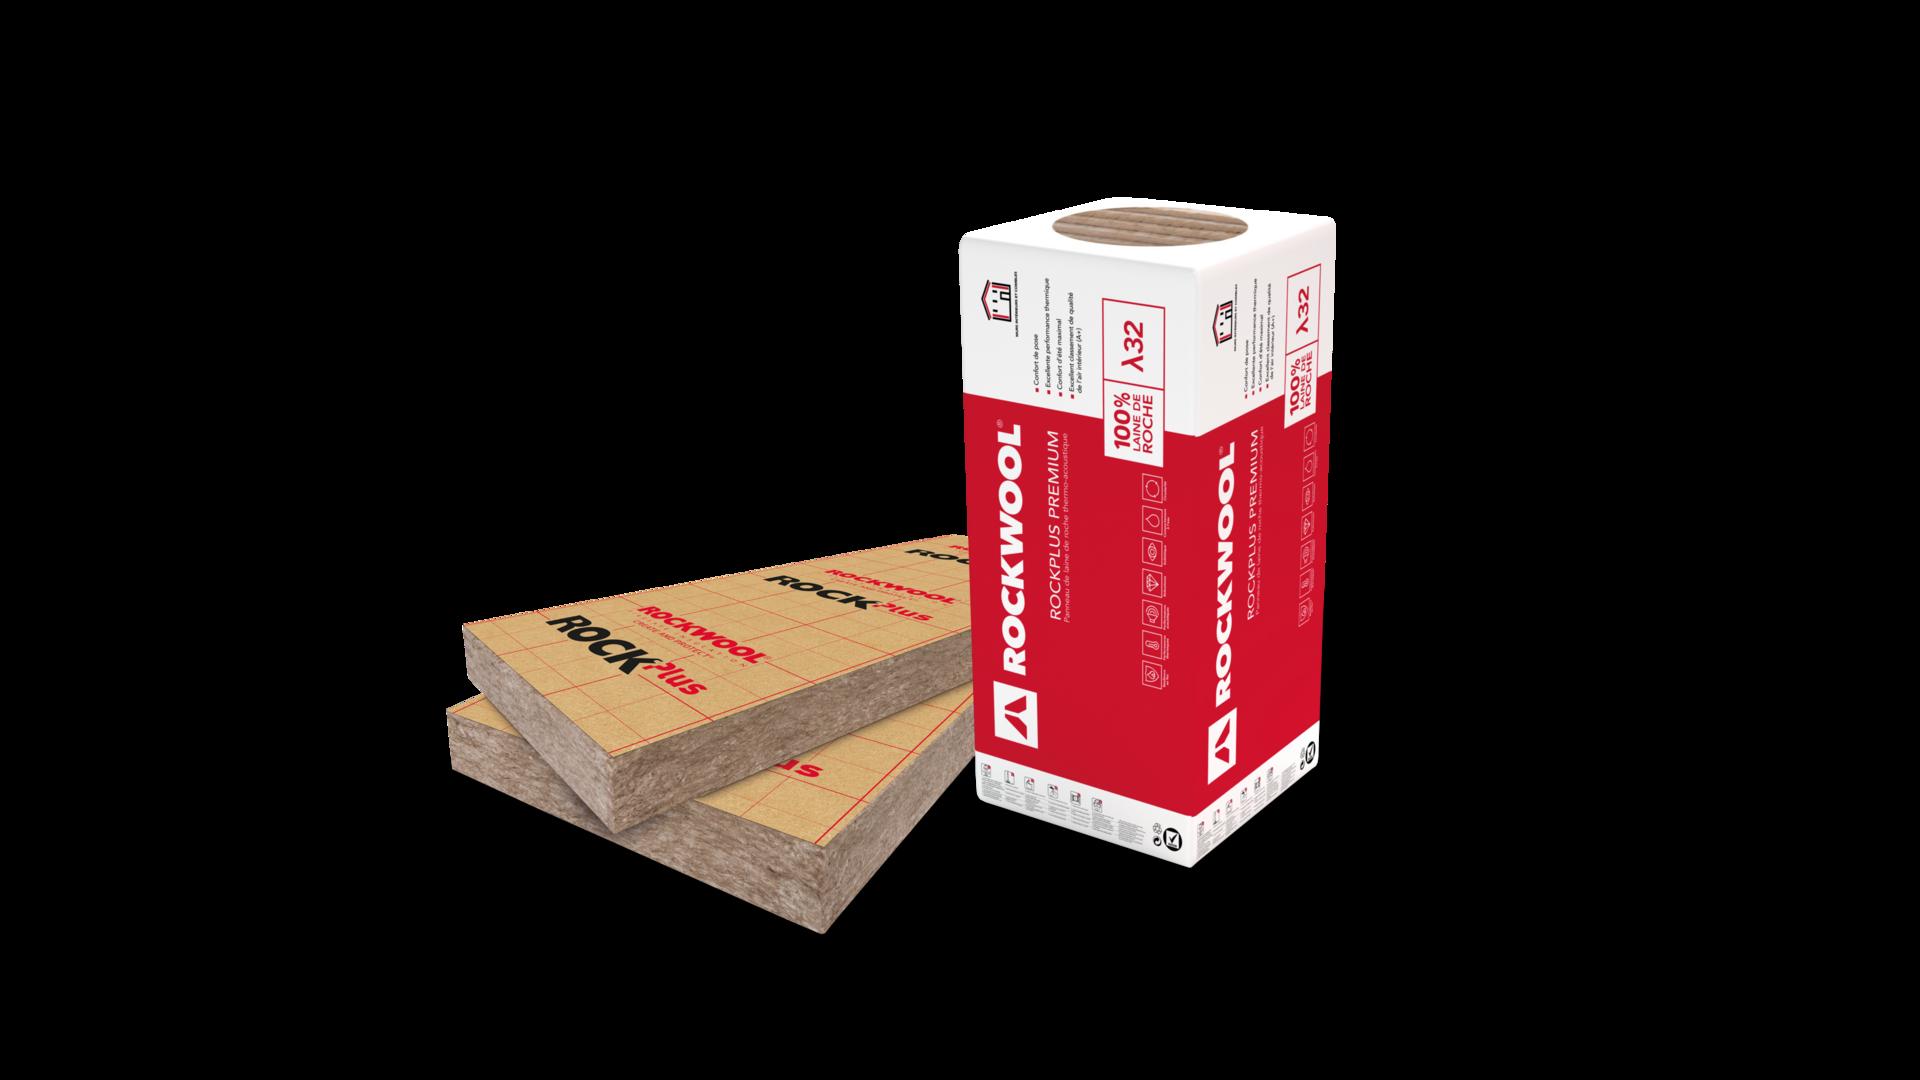 ROCKPLUS PREMIUM KRAFT_emballage